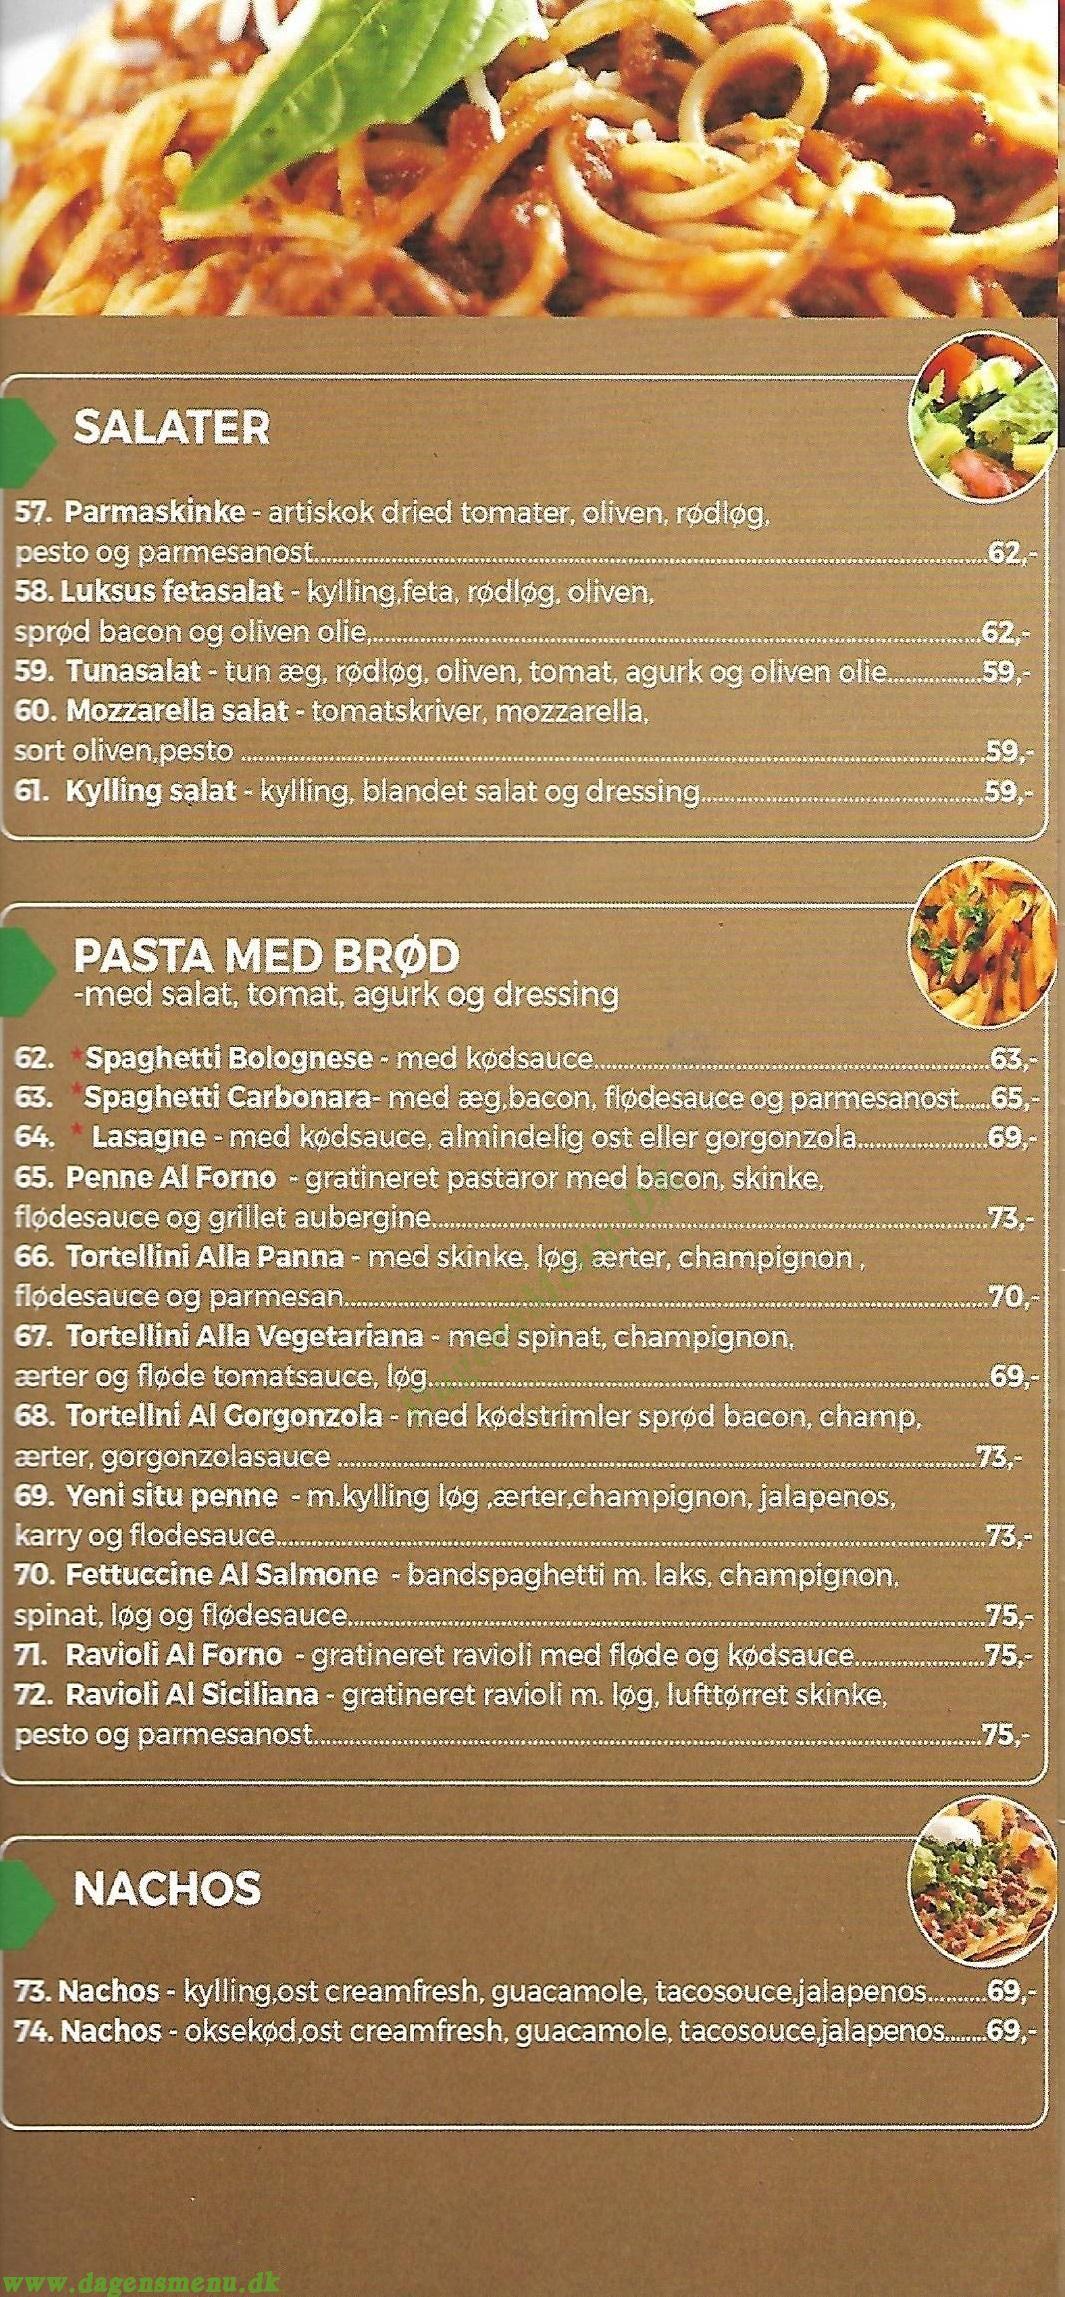 Baguette Company - Menukort